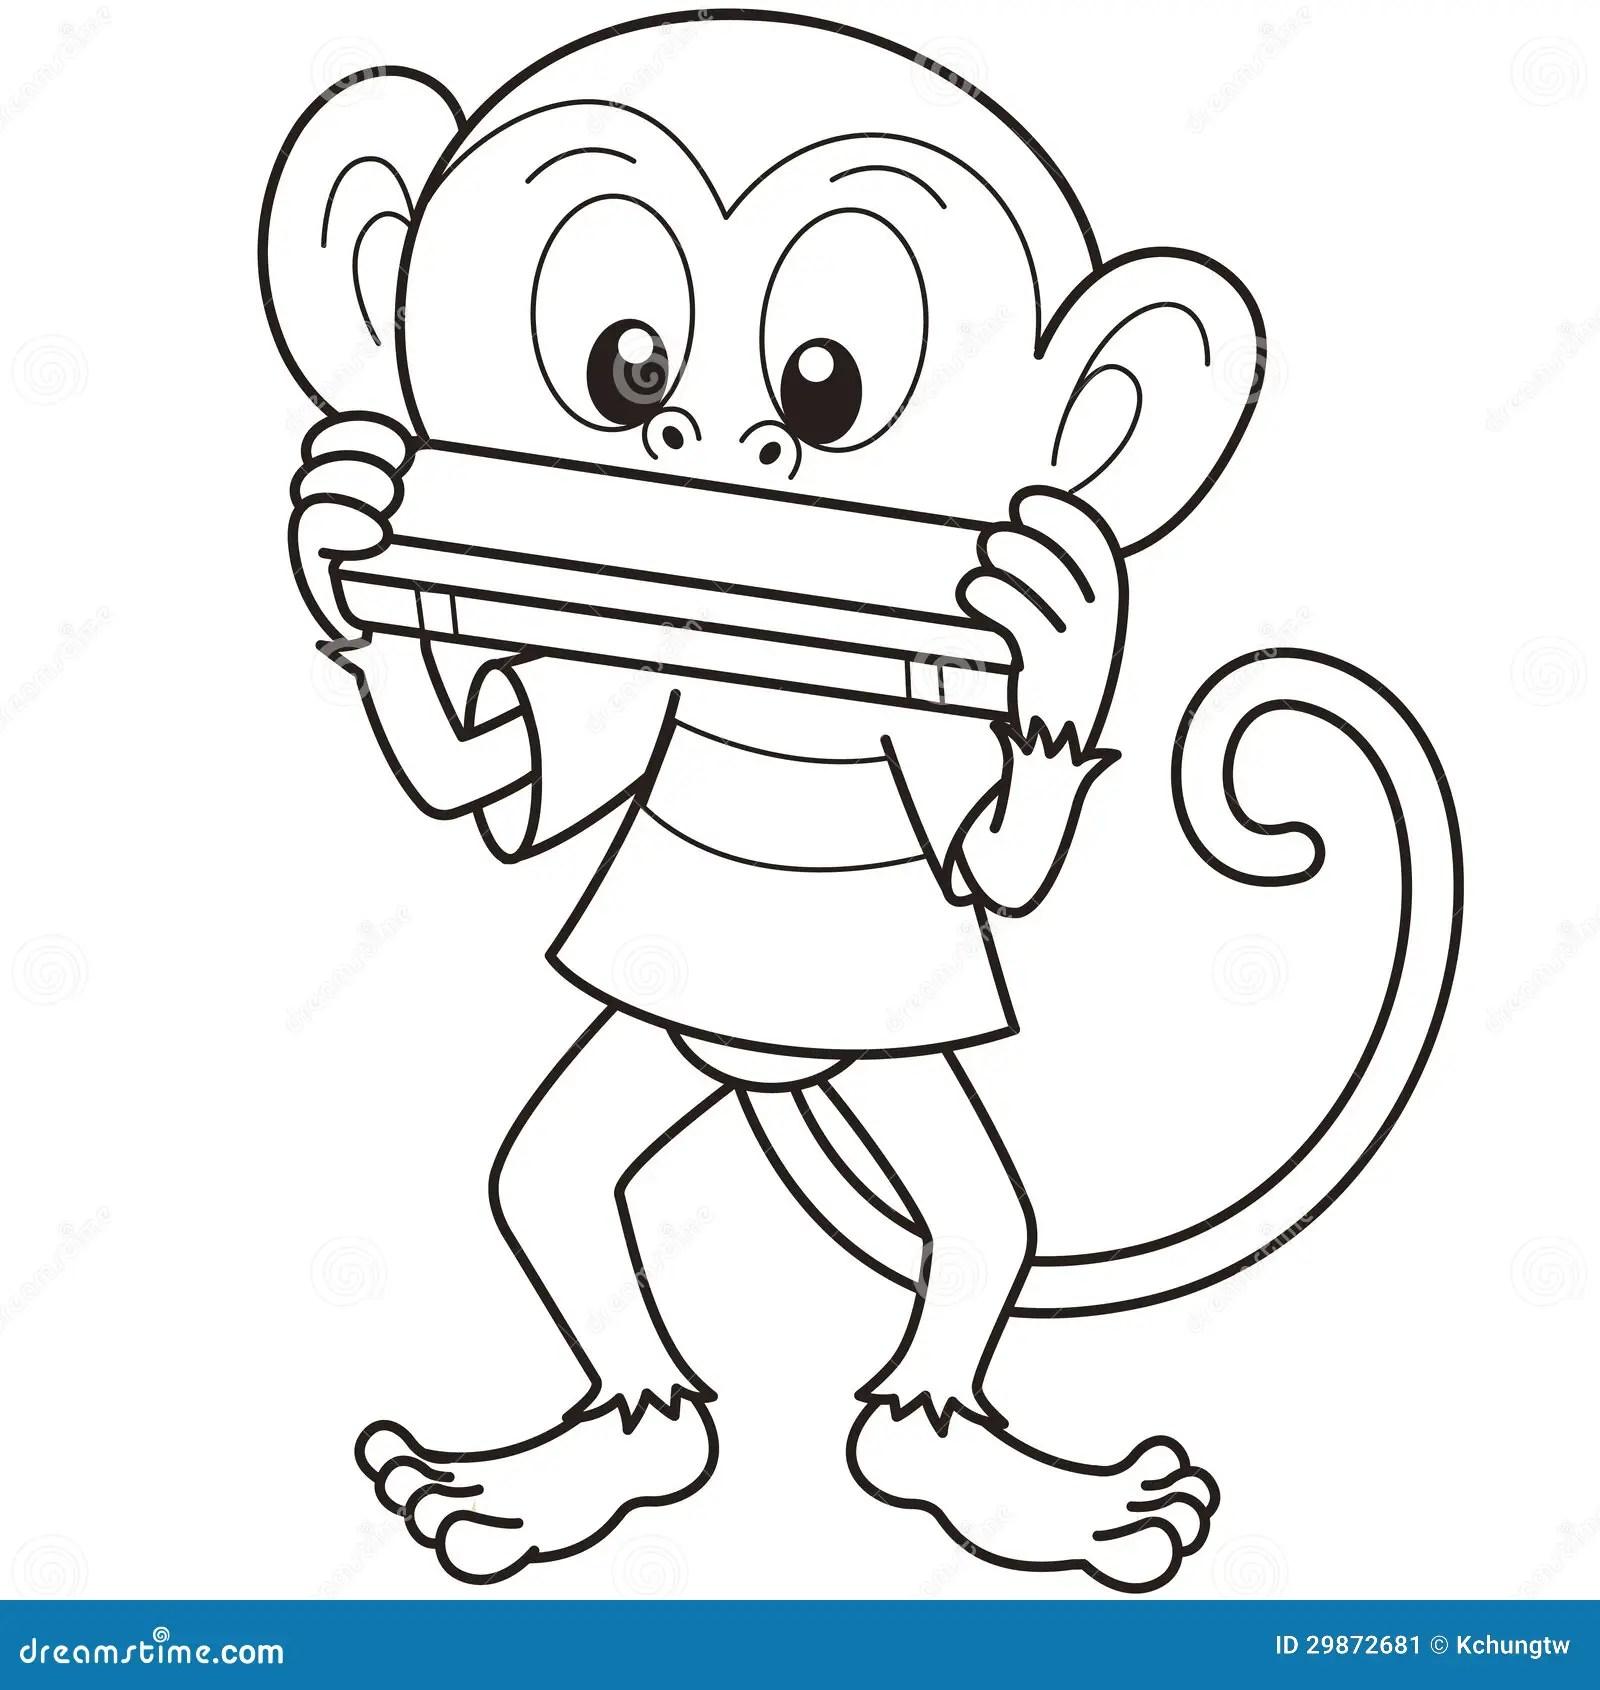 Cartoon Monkey Playing A Harmonica Stock Vector